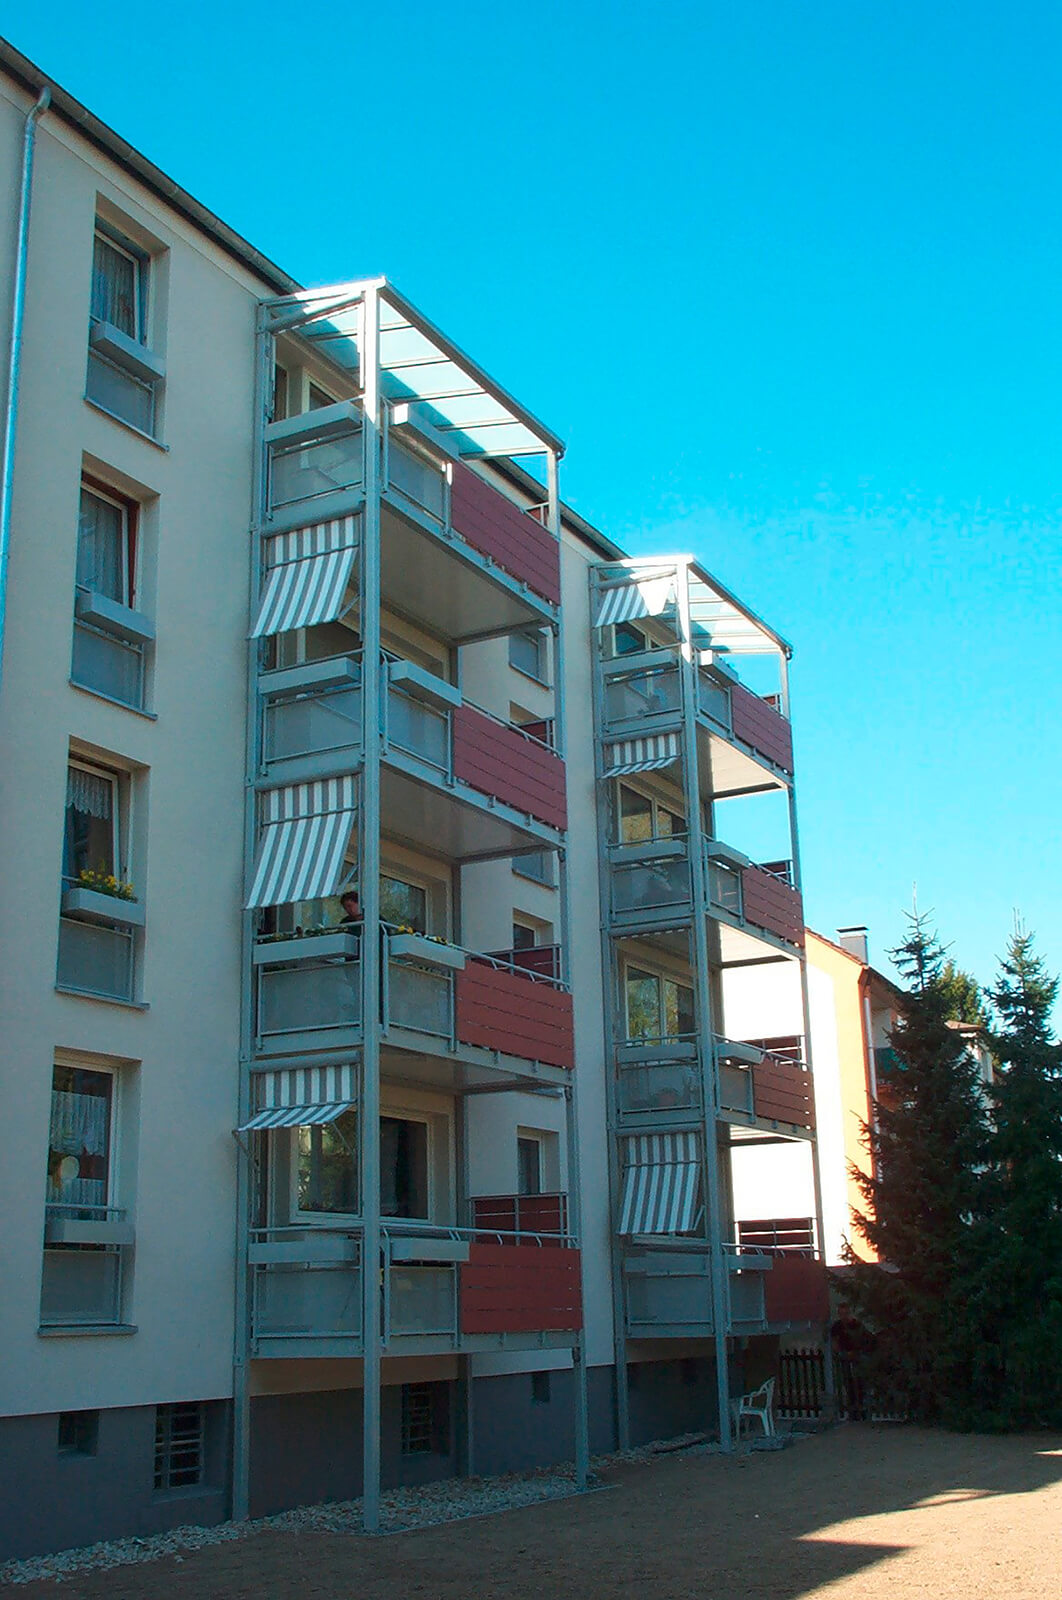 Sonnenschutz Balkonturm Balkondach 1410 Forbis